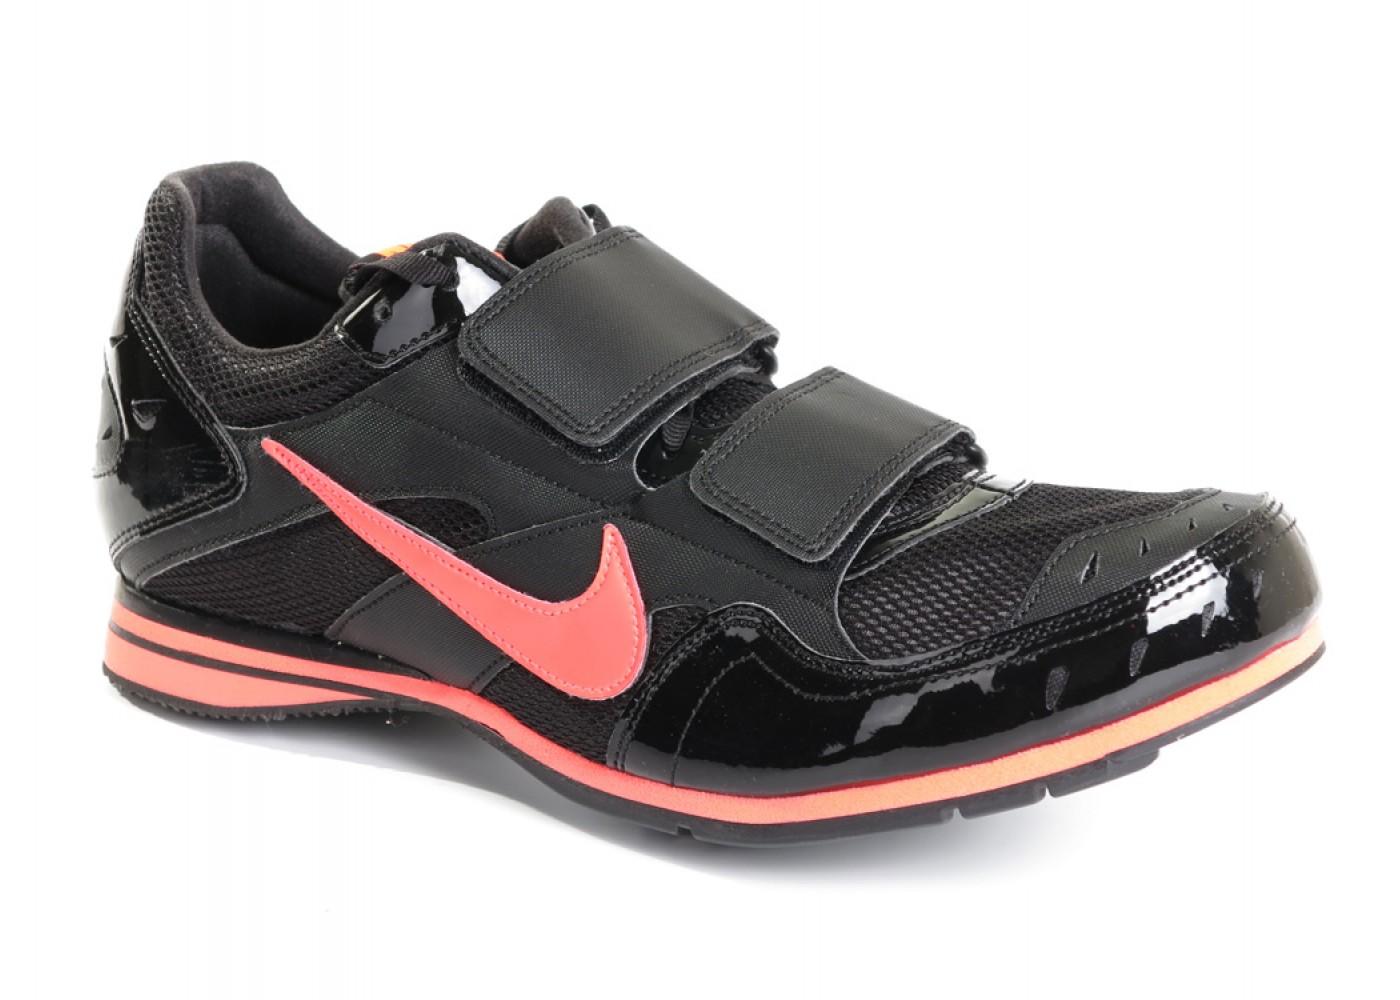 Nike. ZOOM TRIPLE JUMP 3.